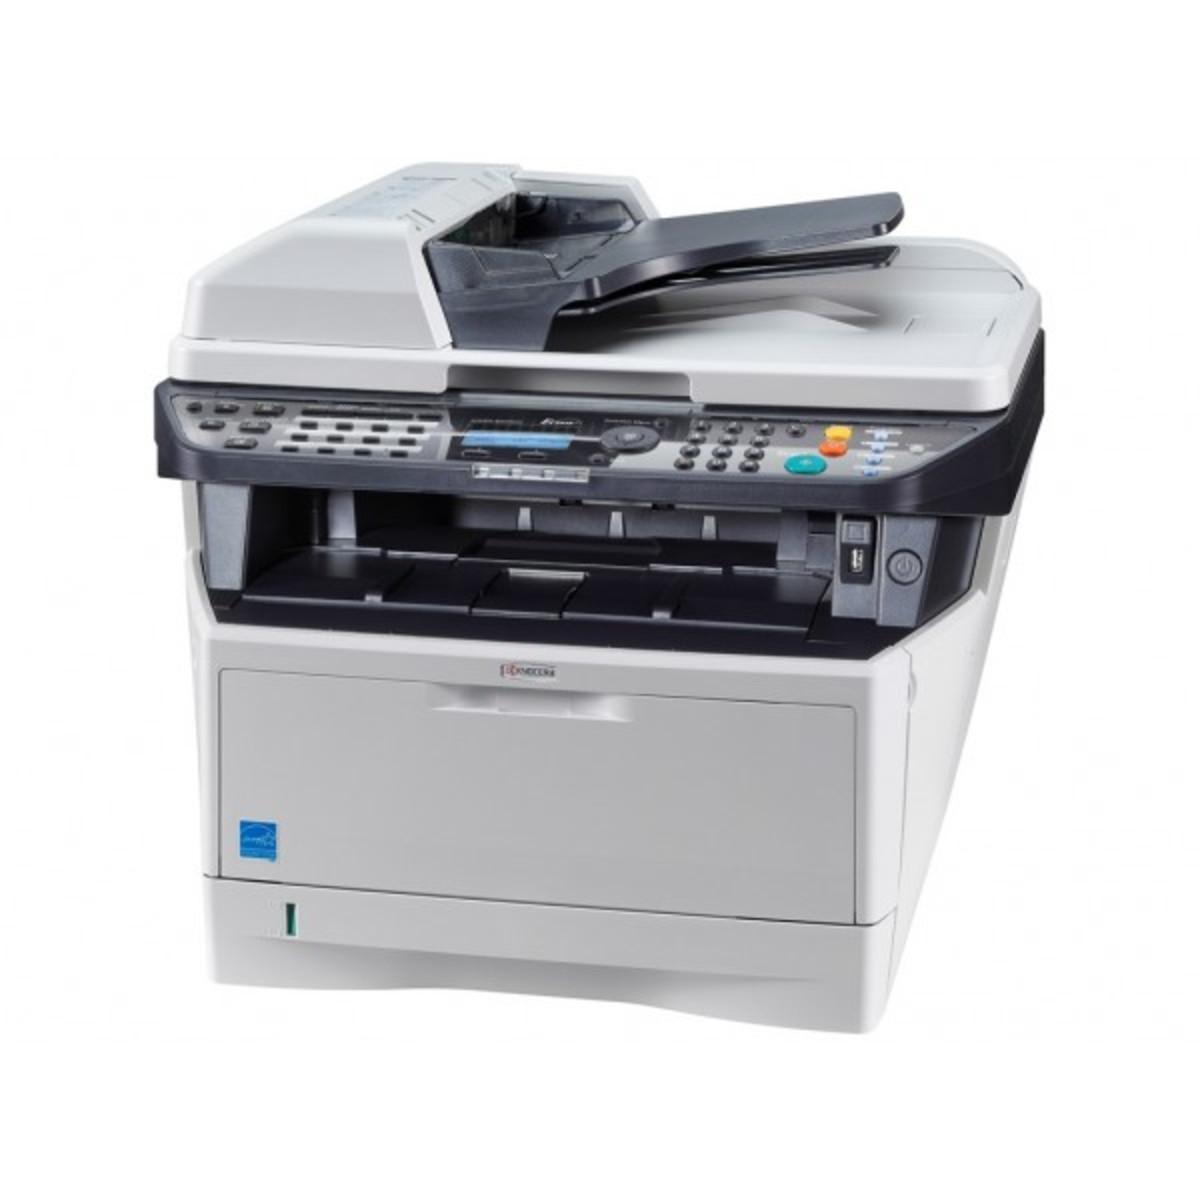 Kyocera ECOSYS M2530dn Mono Laser Printer